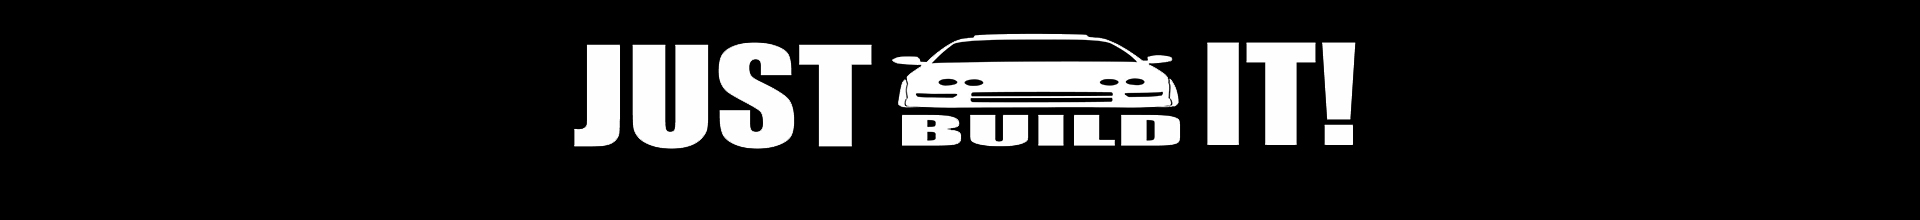 just_build_it